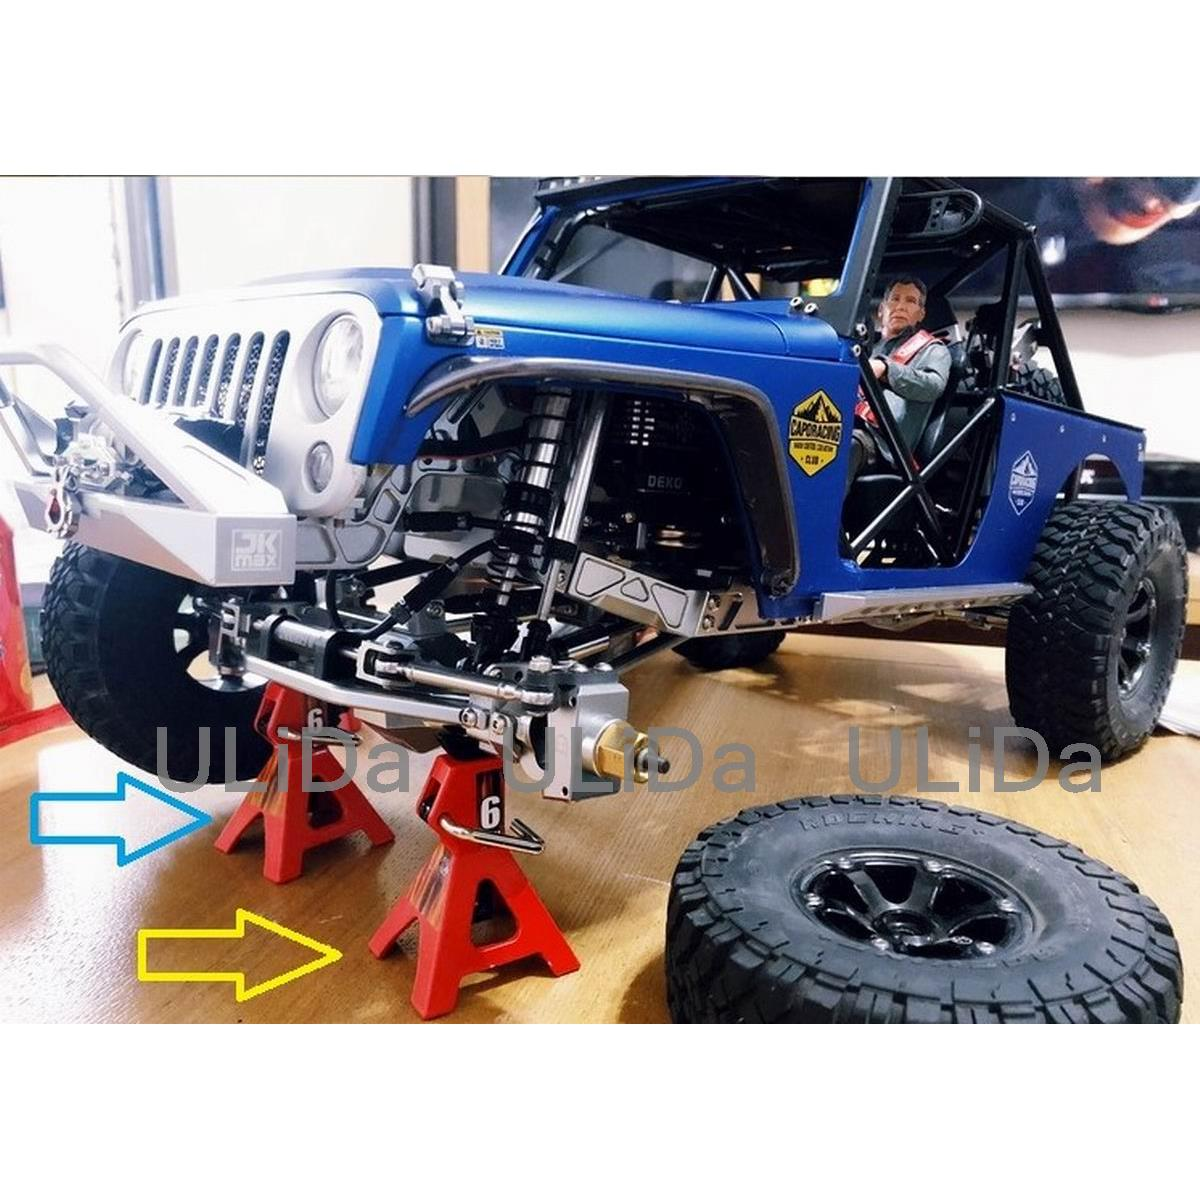 2pcs 1//10 Mini Simulation Metal Jack Stands Yellow Fits for D90 SCX10 RC Crawler Model Car VGEBY1 RC Lifting Jack 6tone